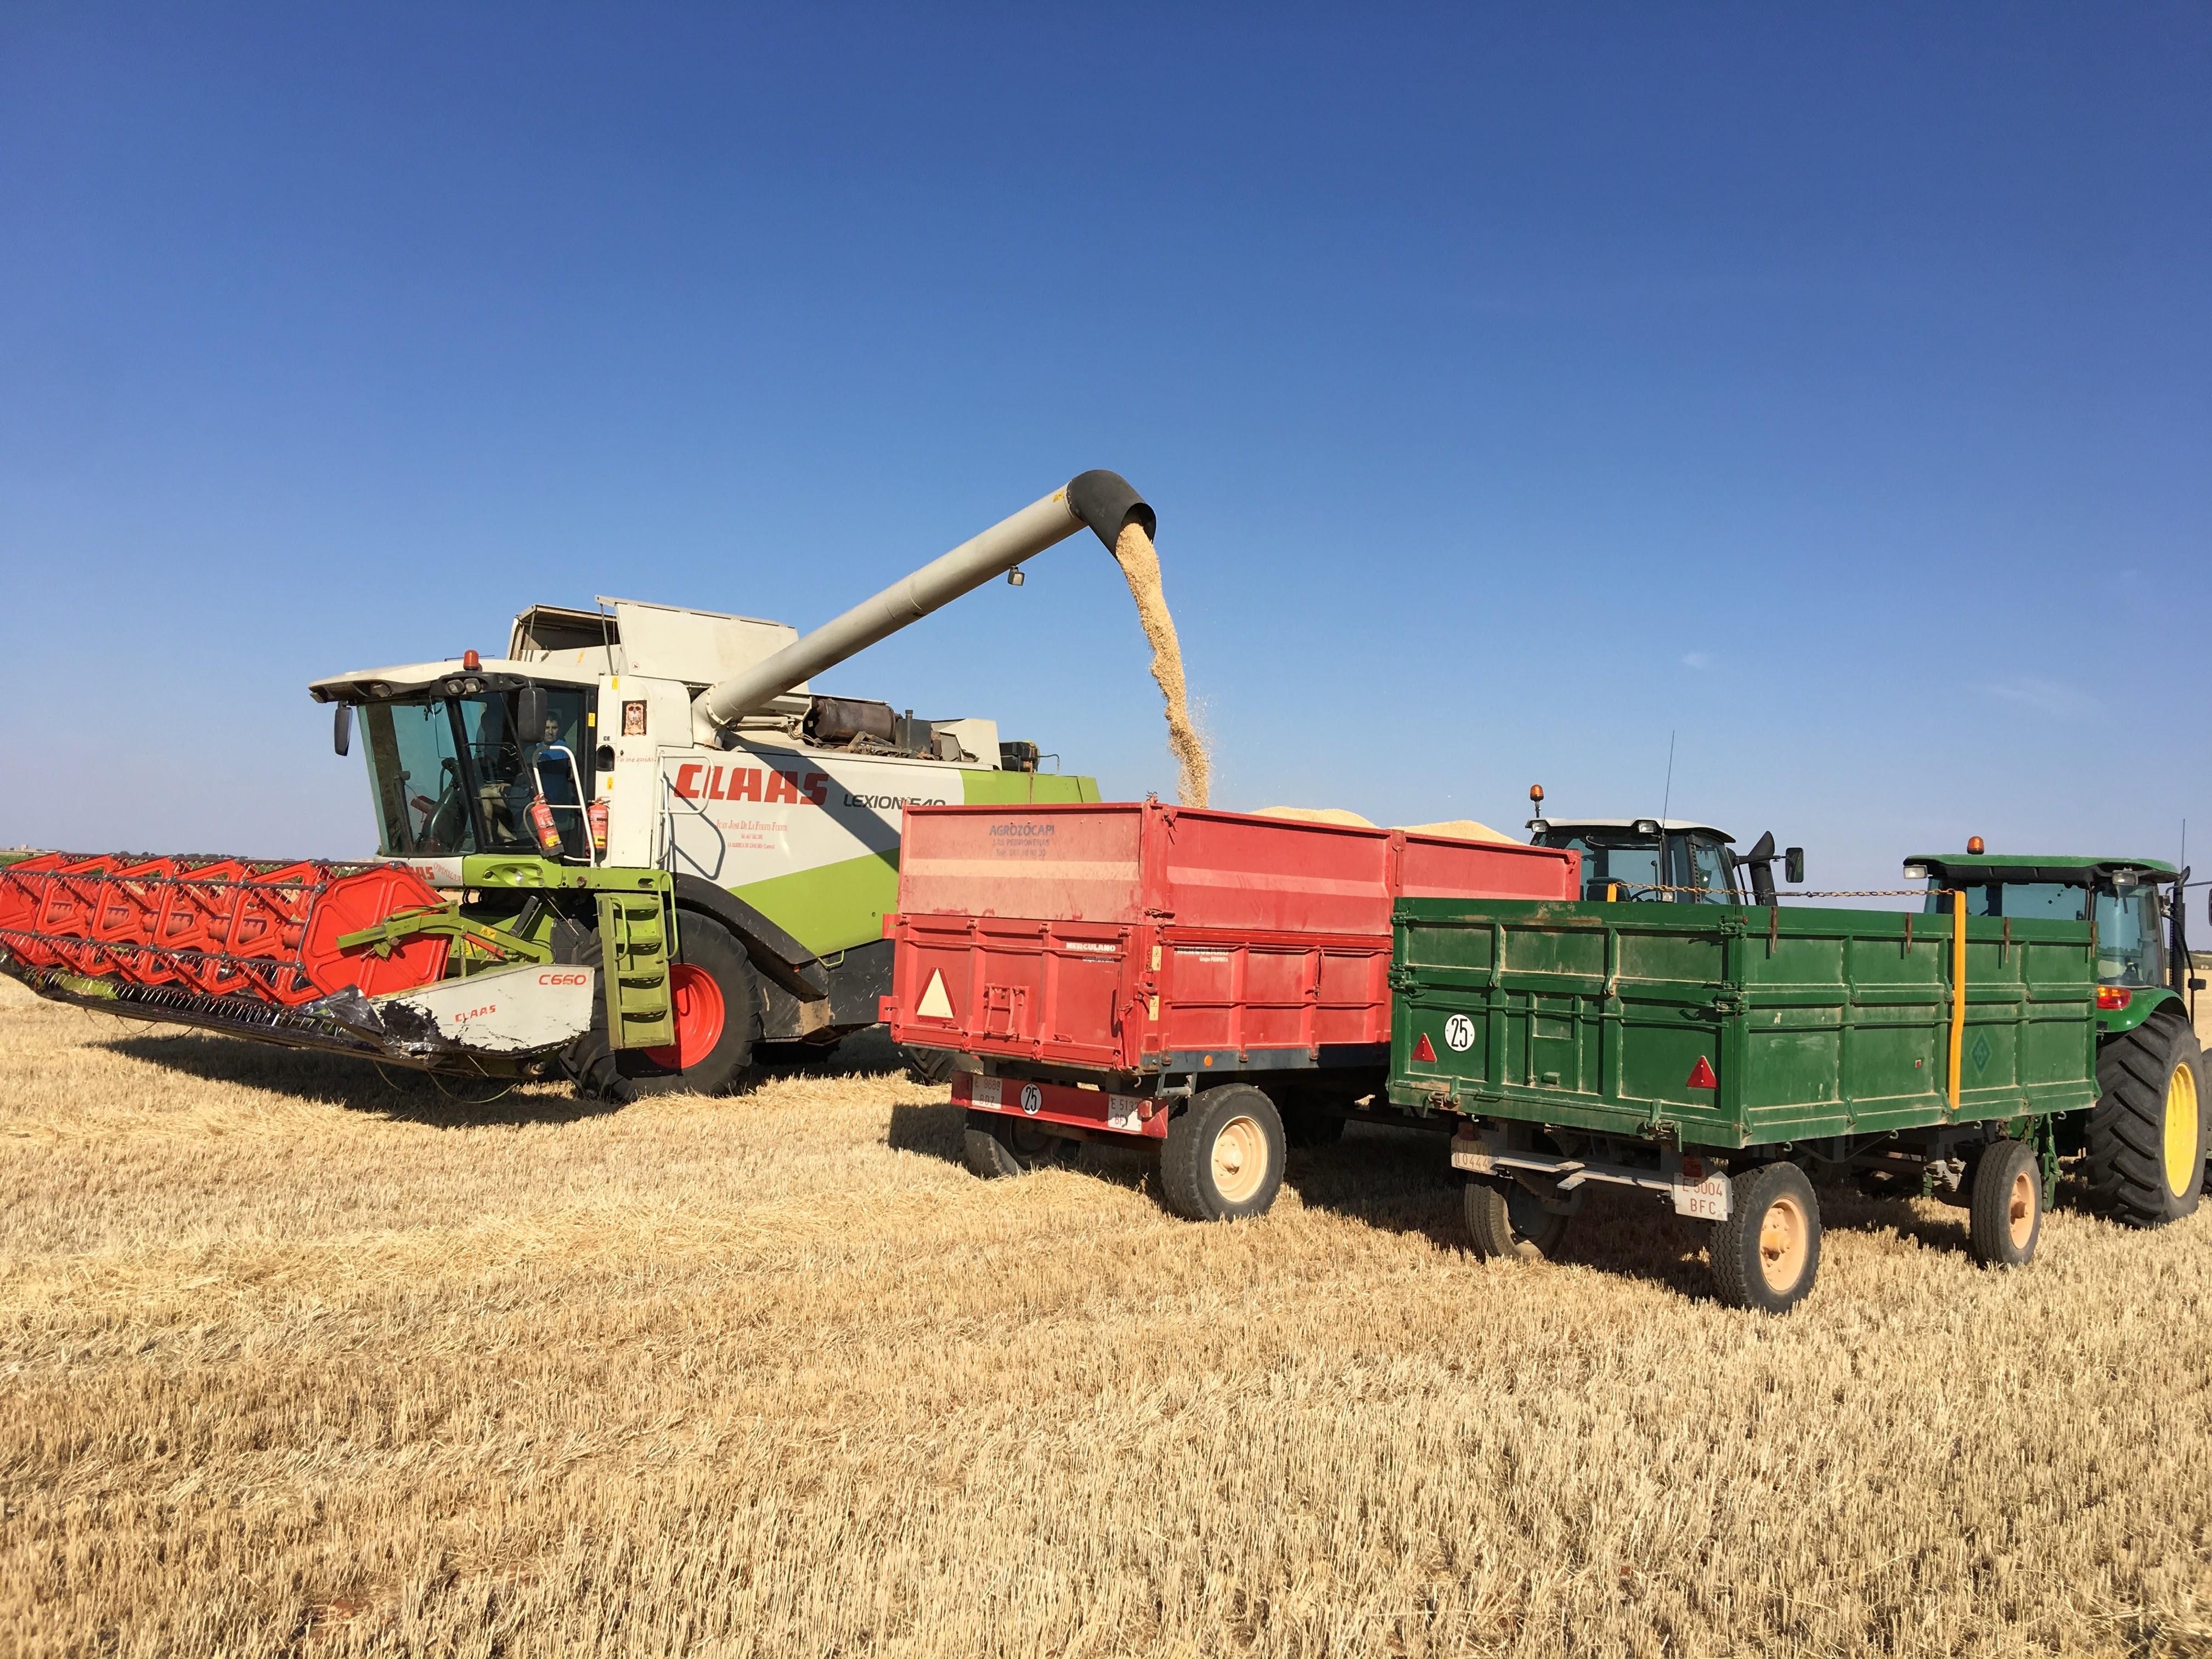 Cosecha-harvesting-2017-20